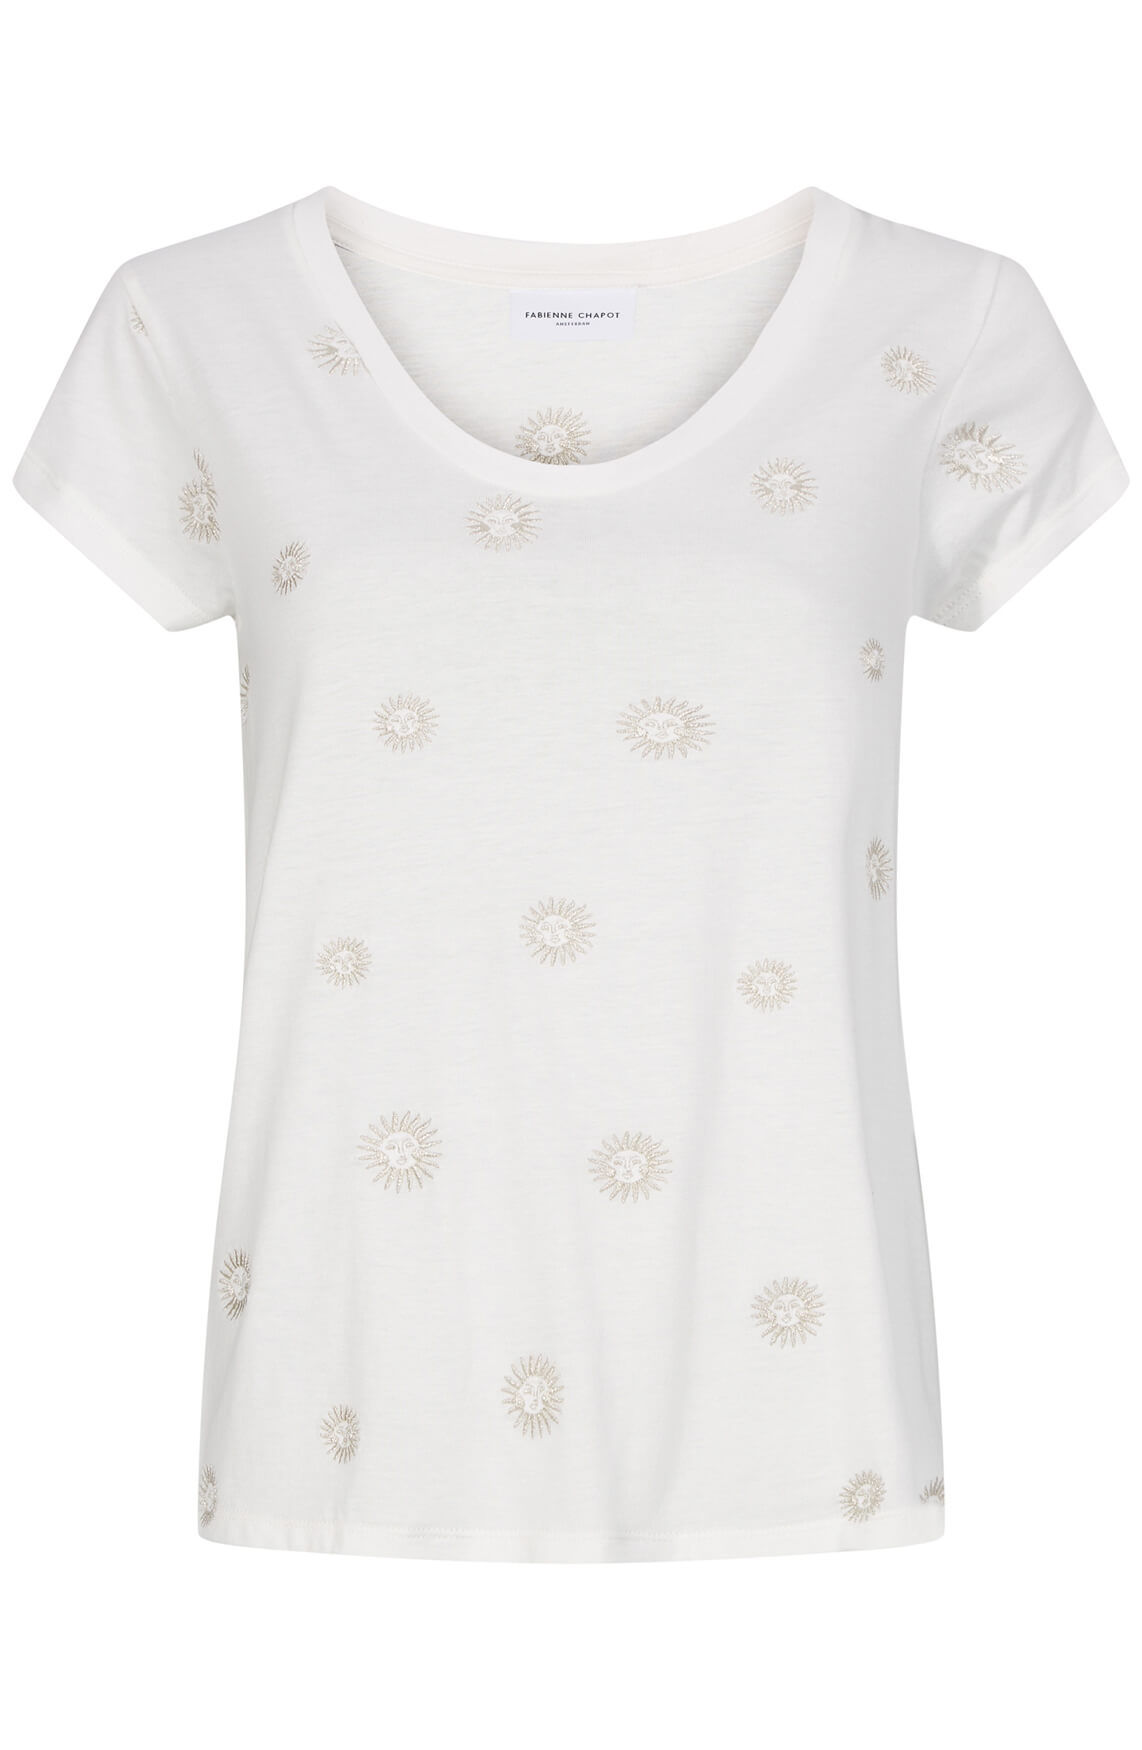 Fabienne Chapot Dames Krista shirt wit